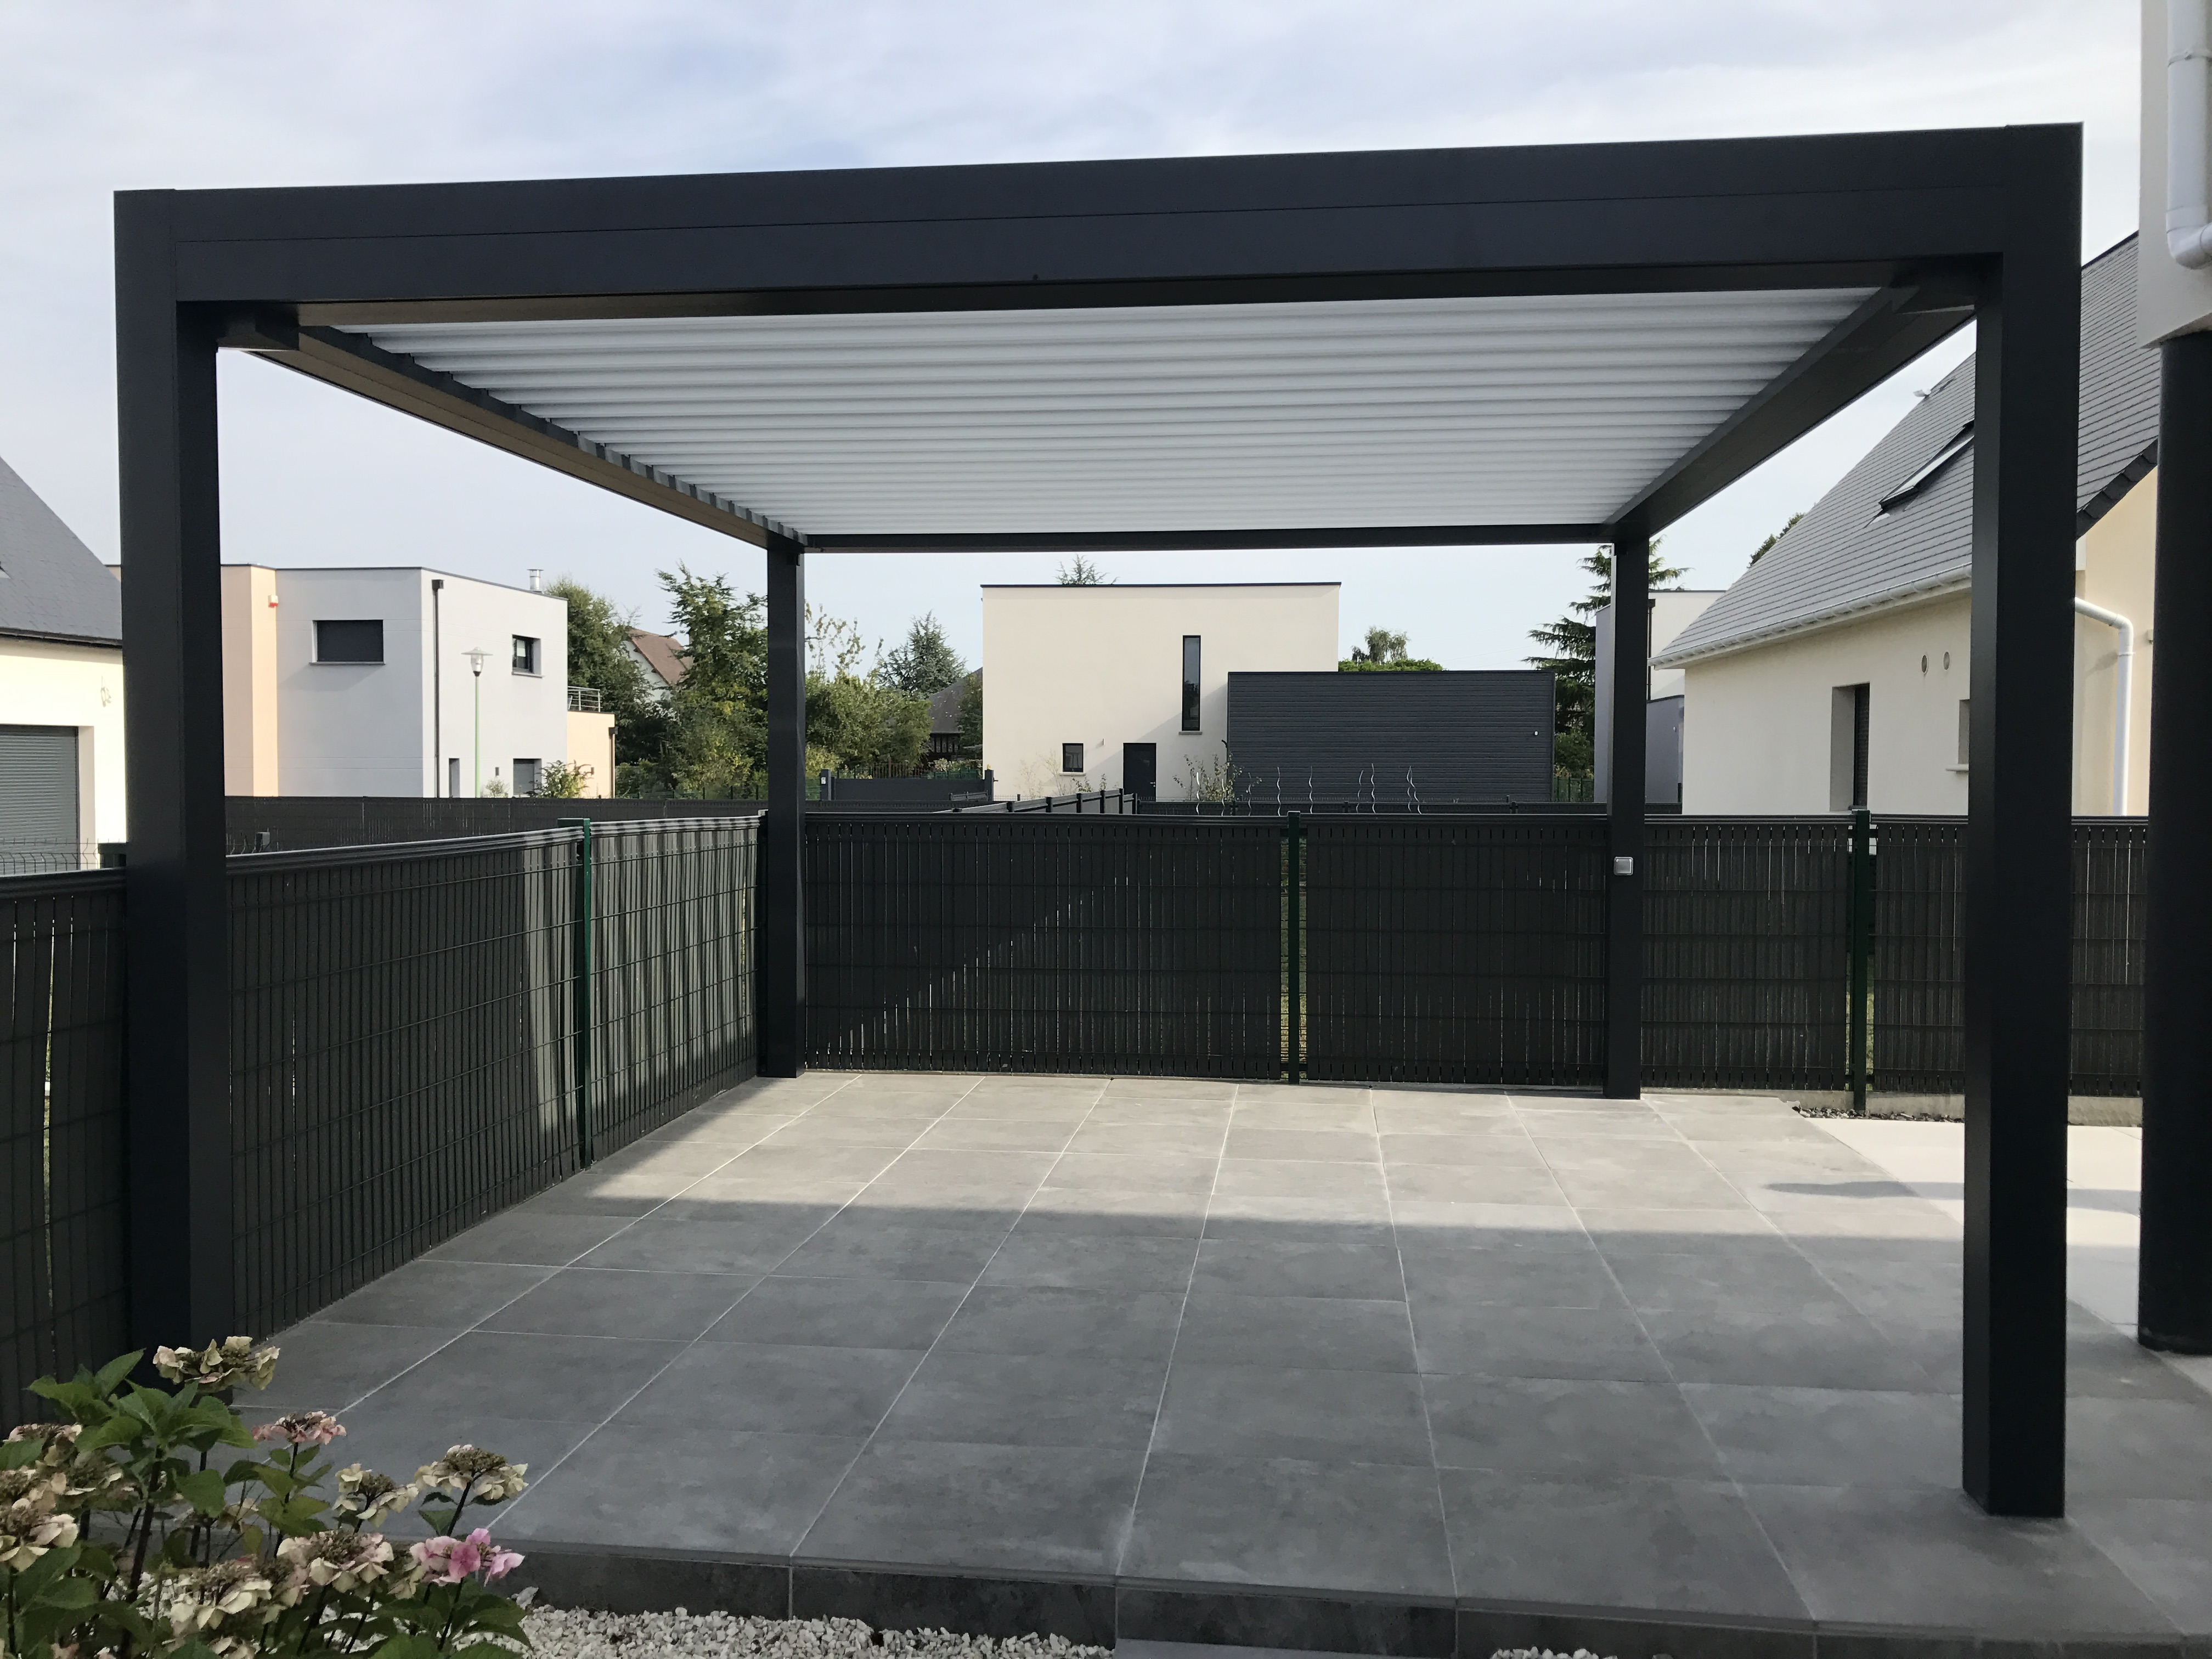 Installation pergola bio-climatique près de Rouen